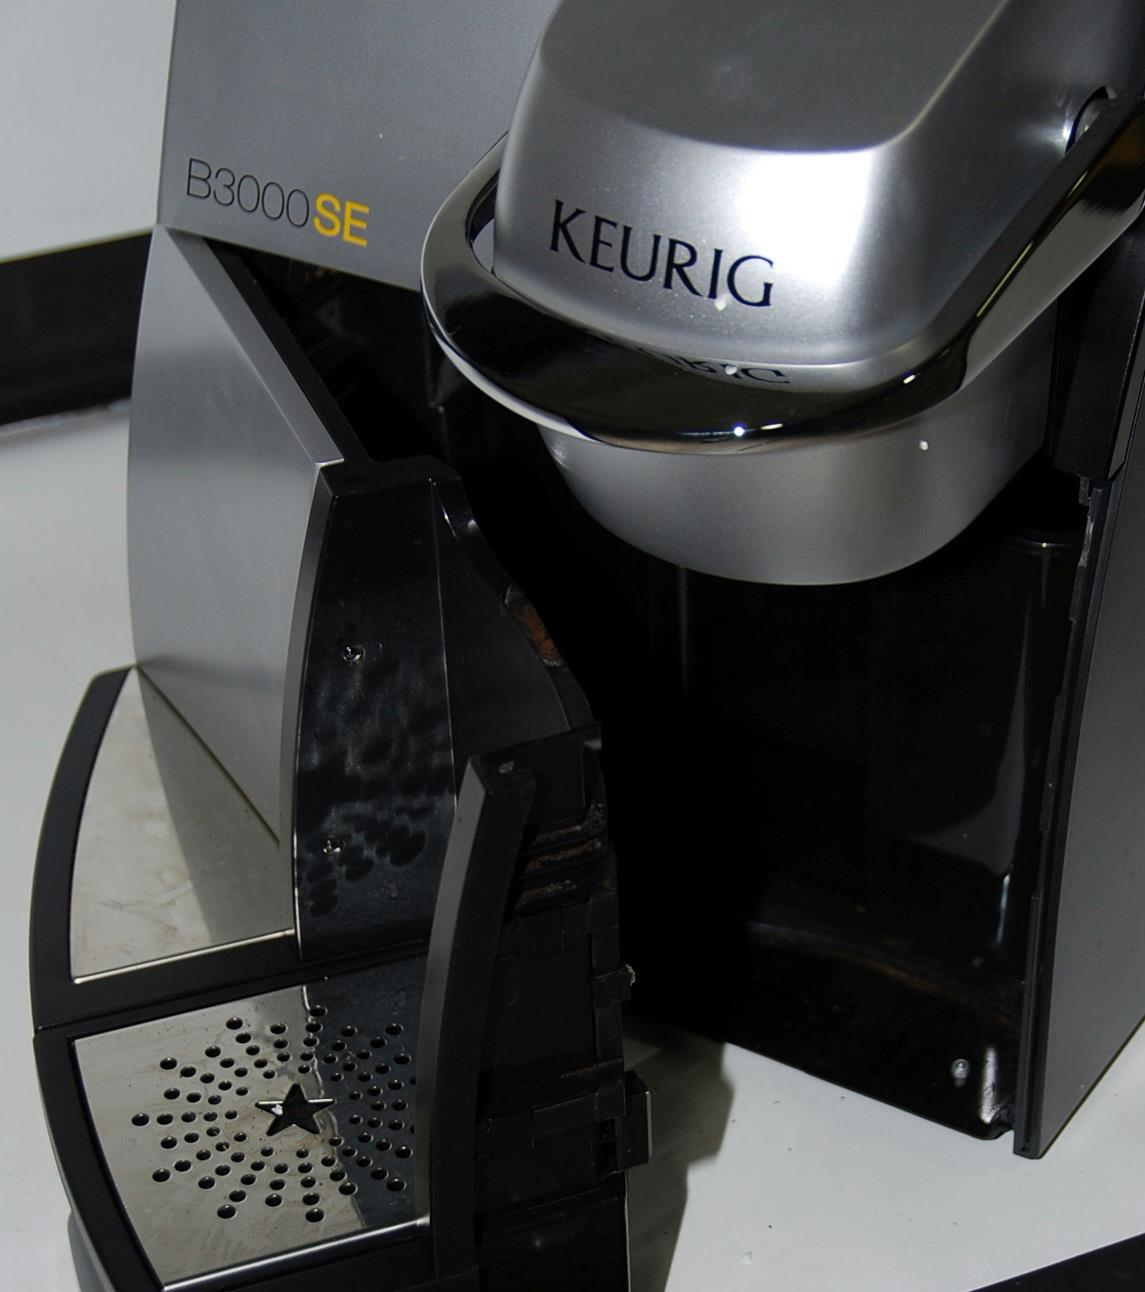 Keurig B3000SE Commercial Single Serve Coffee Maker *Read